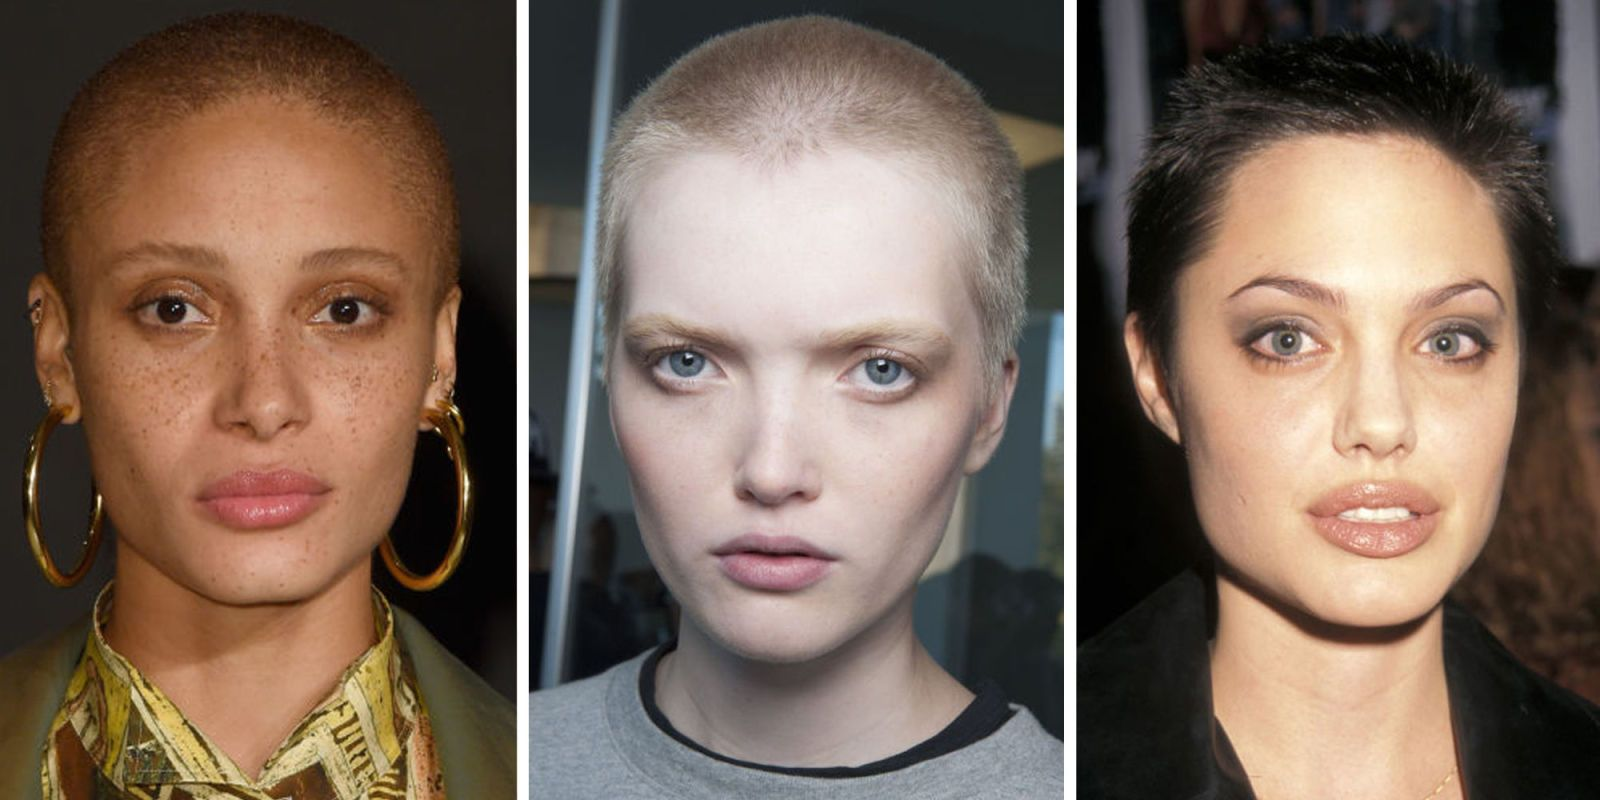 All shaved models